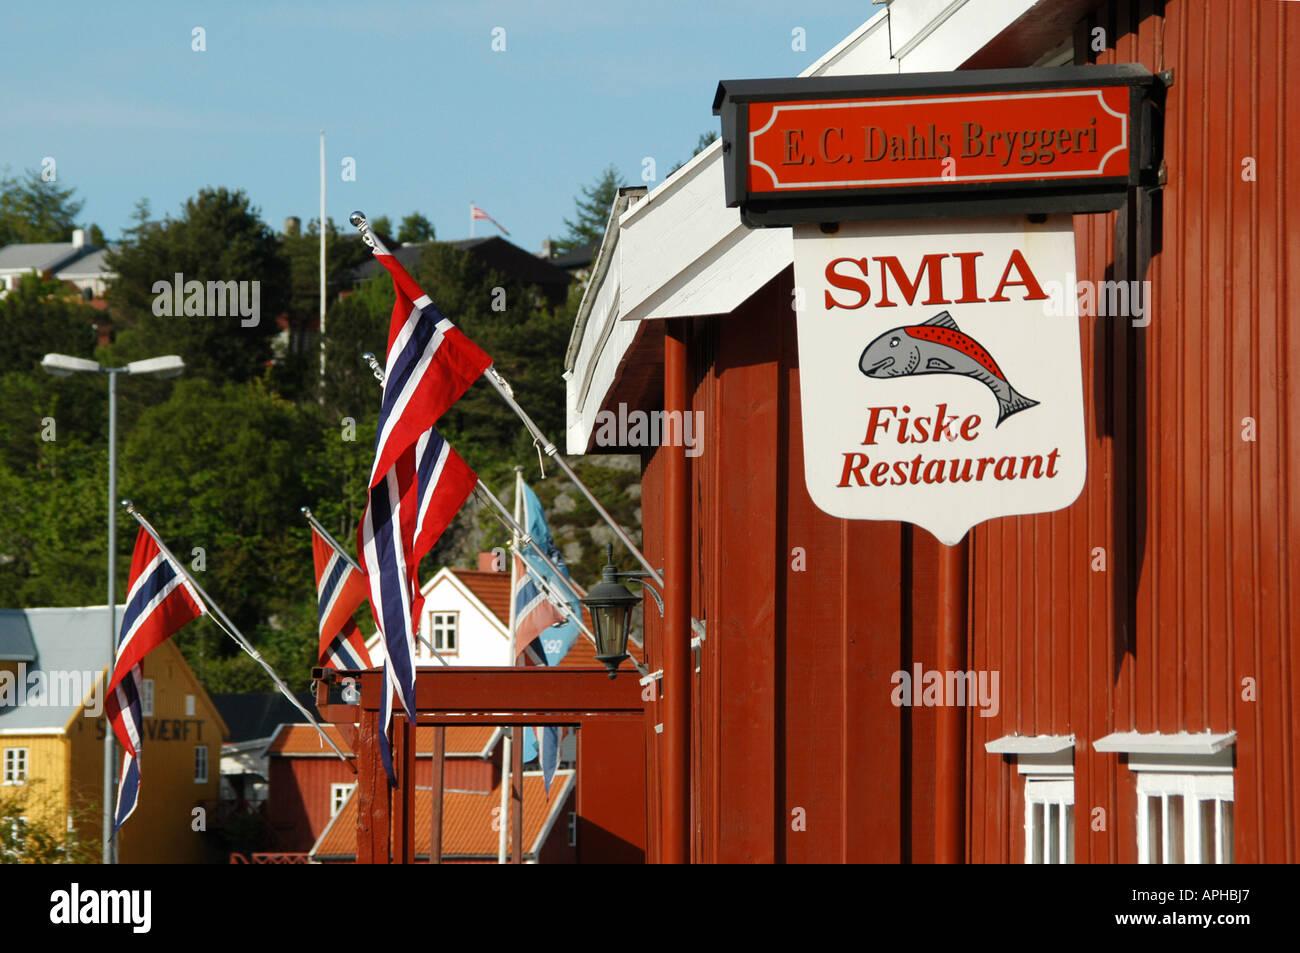 Smia restaurant